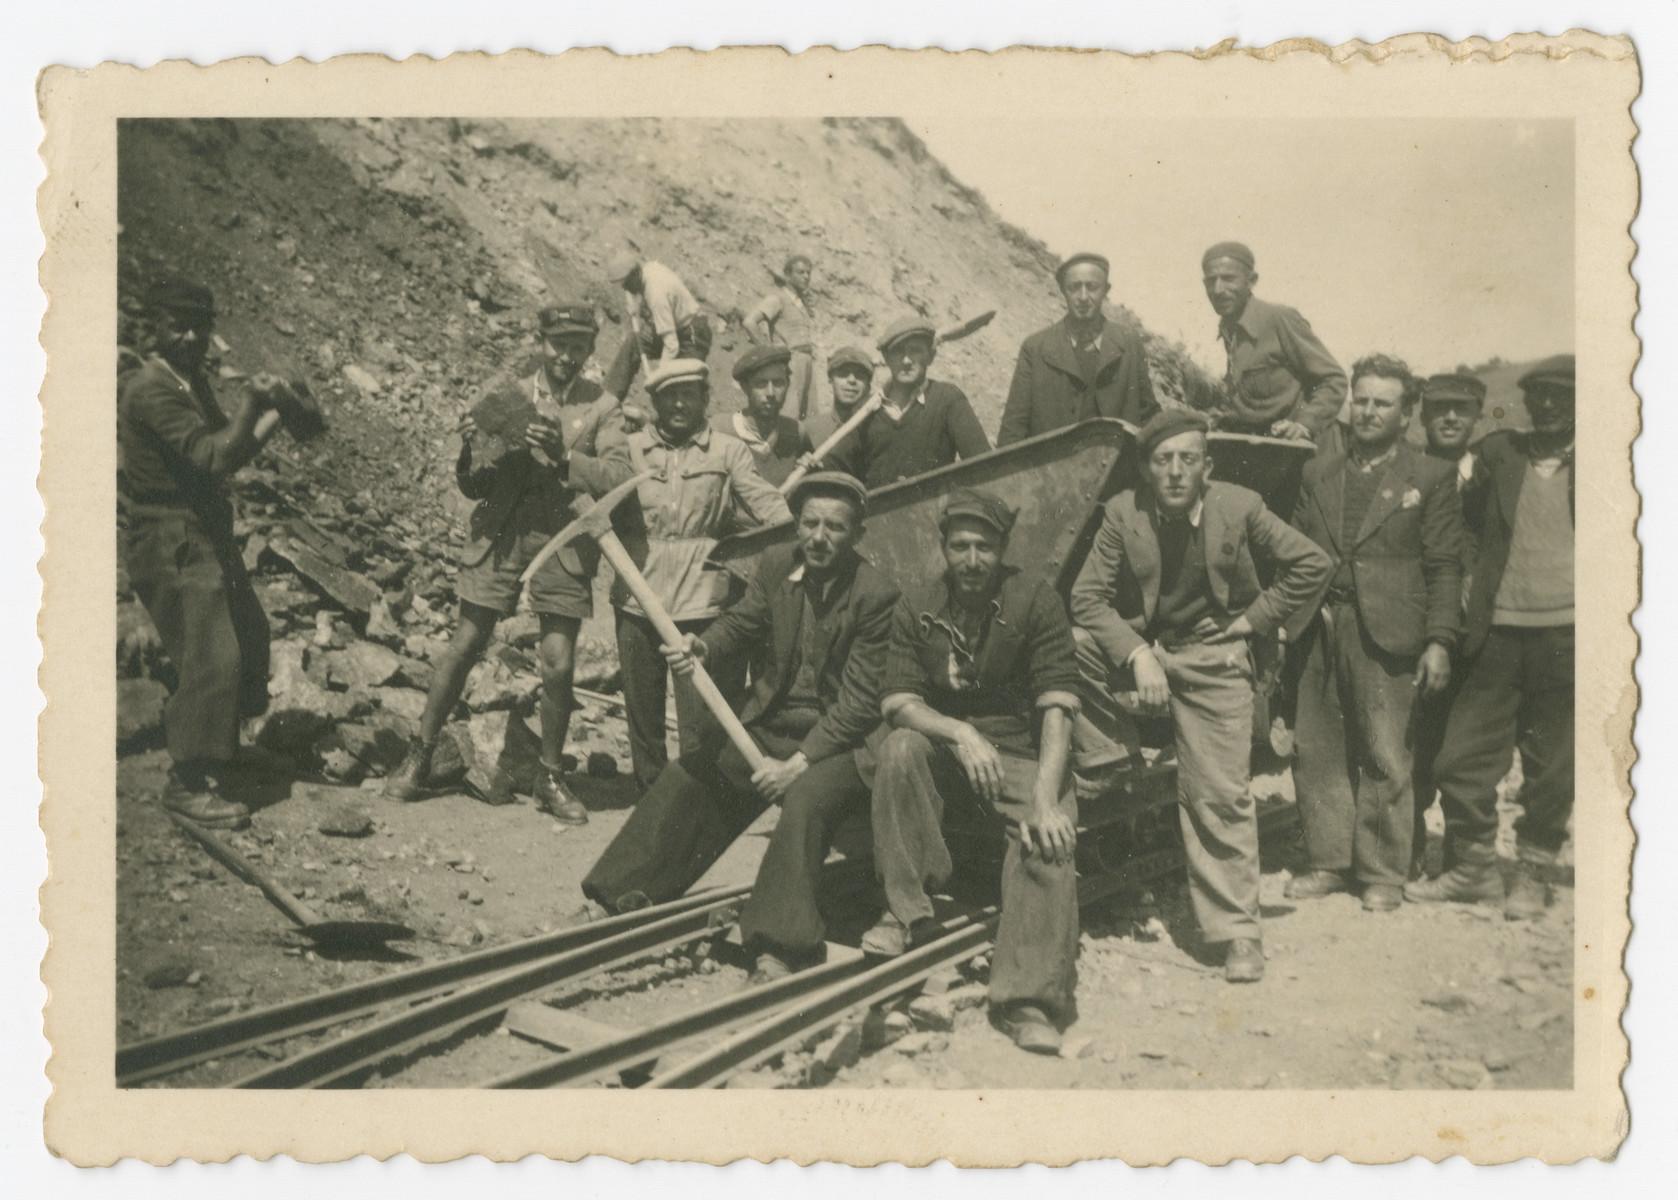 Internees construct train tracks in a Bulgarian labor camp.